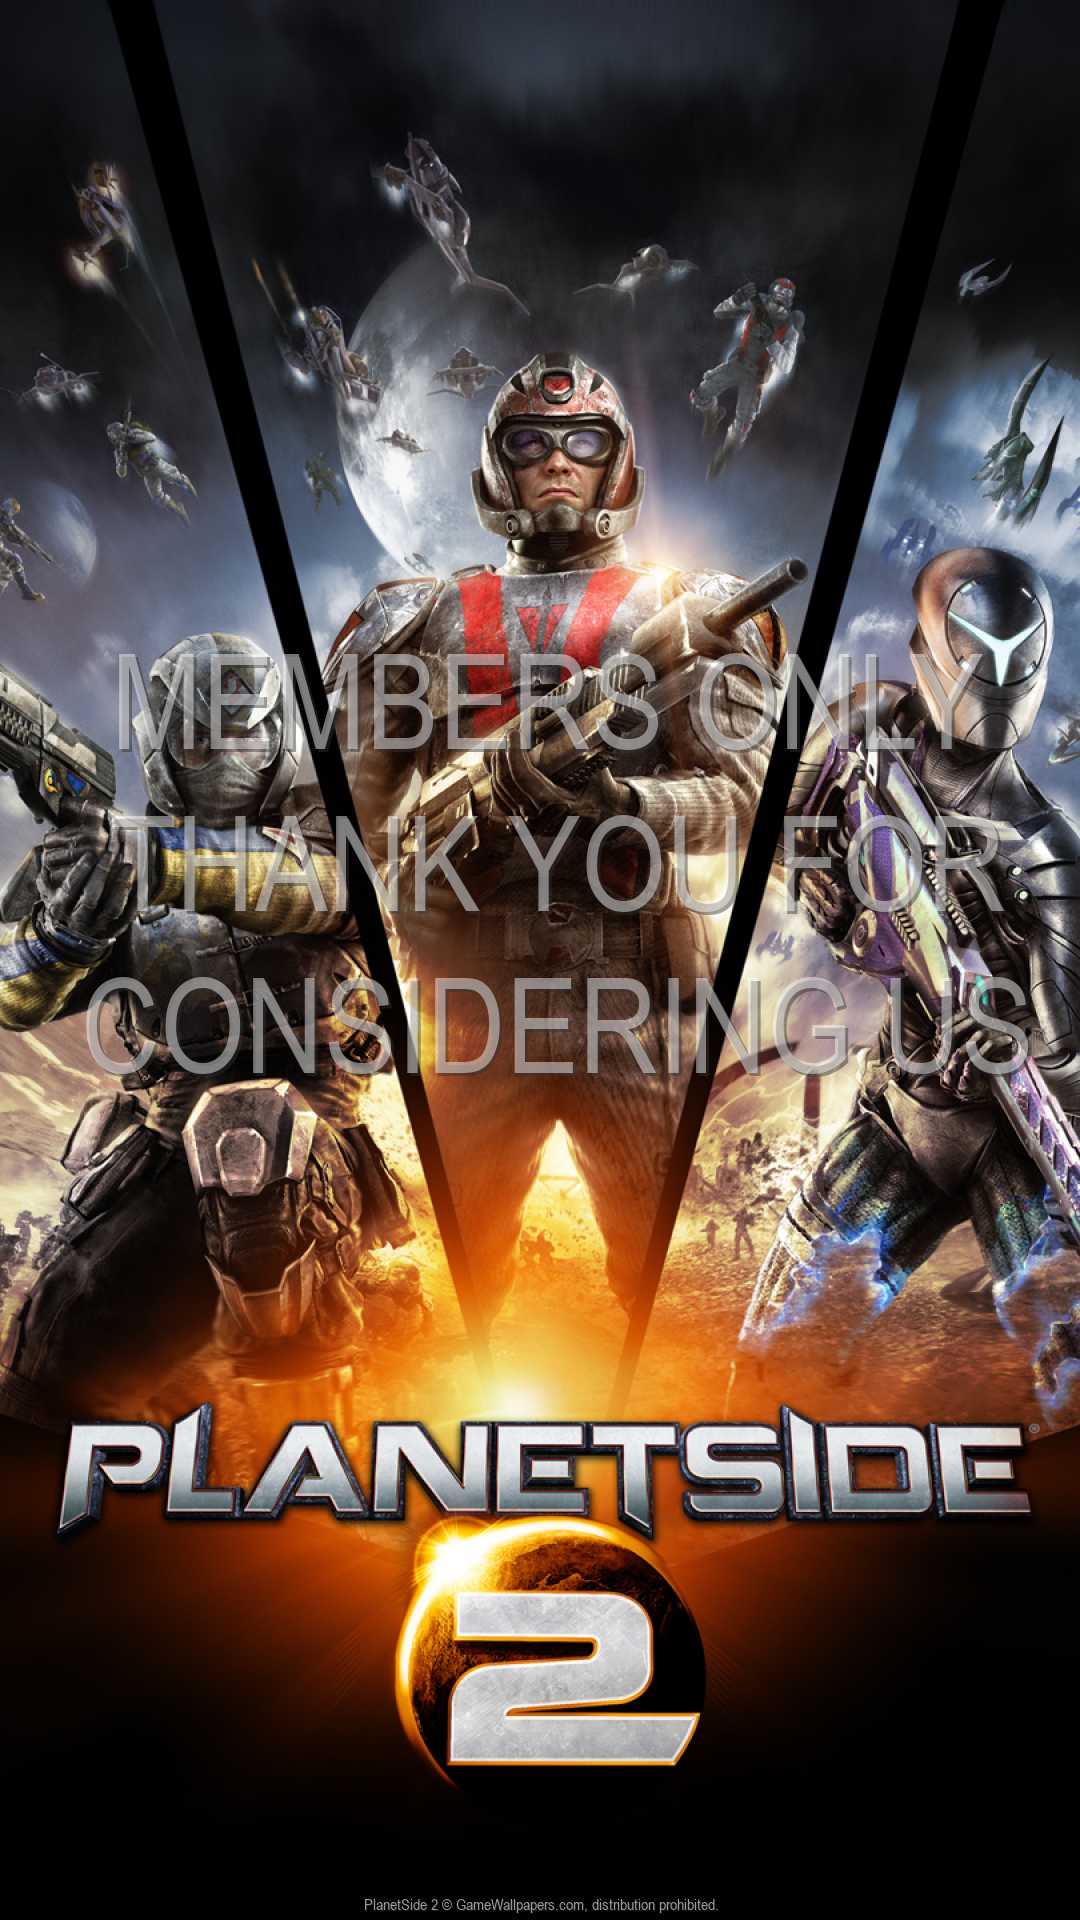 PlanetSide 2 1080p Vertical Móvil fondo de escritorio 03